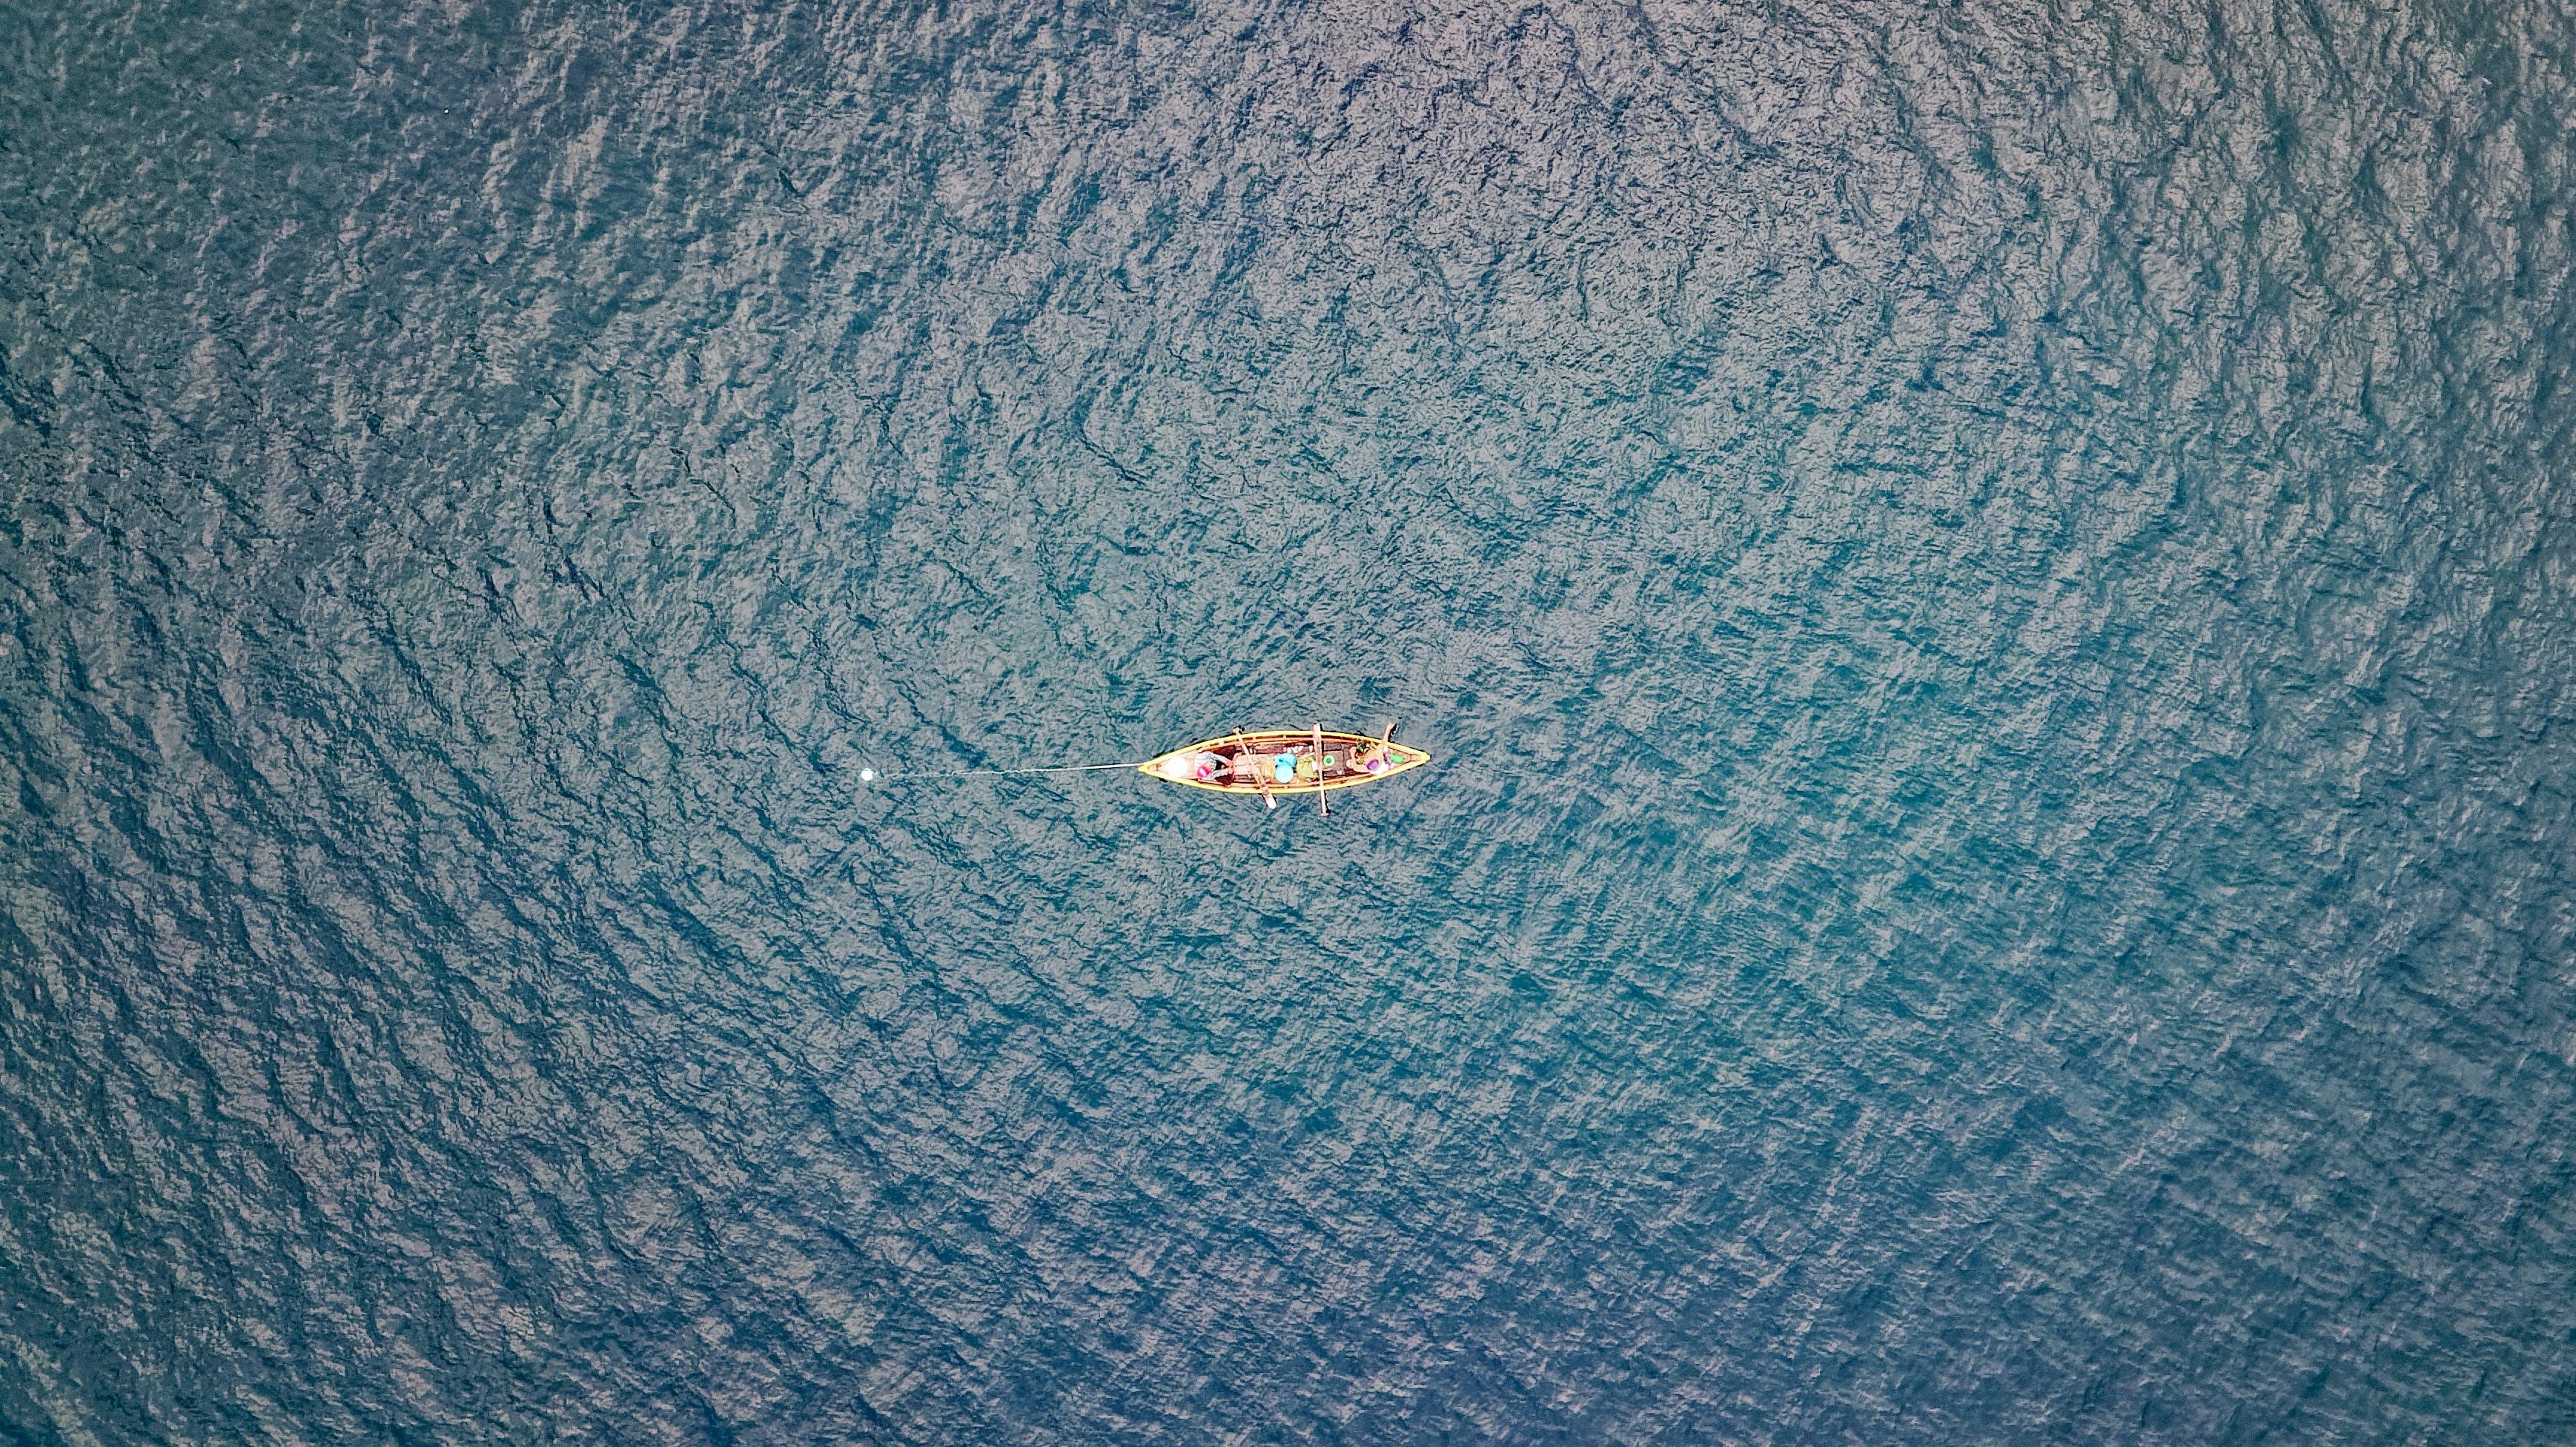 Gratis arkivbilde med båt, dagslys, droneopptak, farger